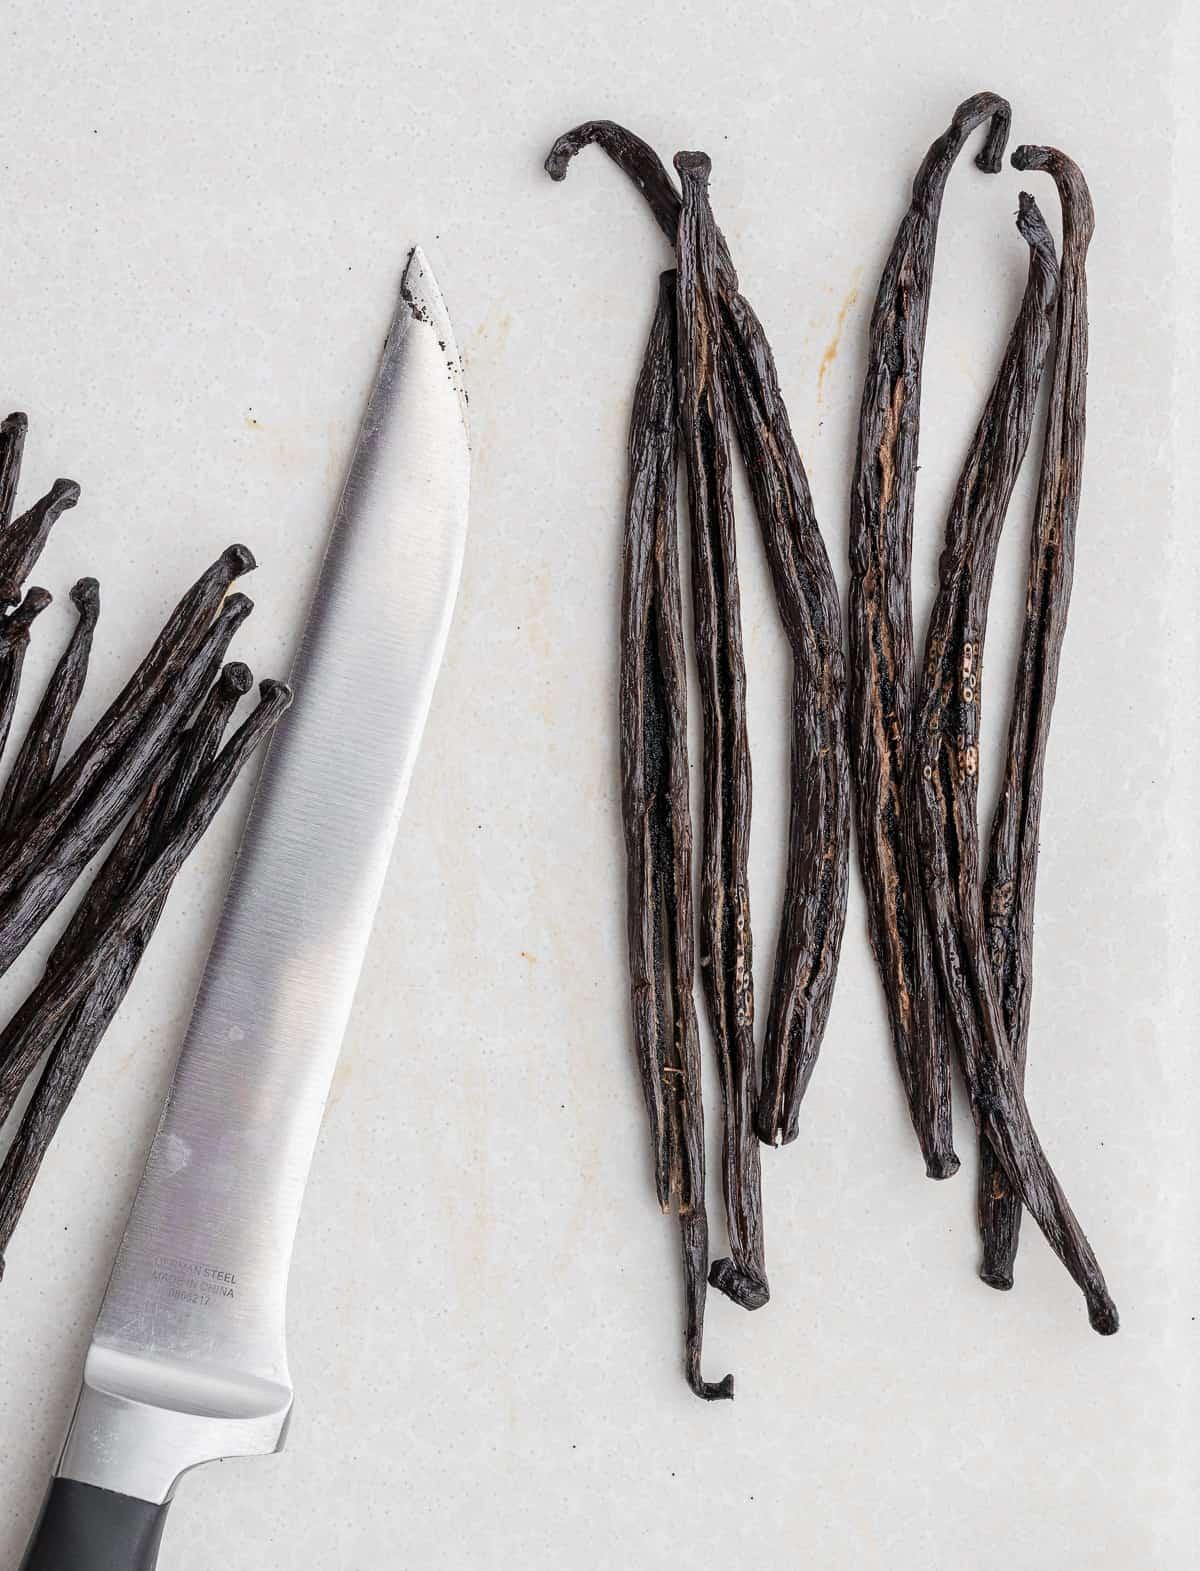 madagascar vanilla beans sliced in half